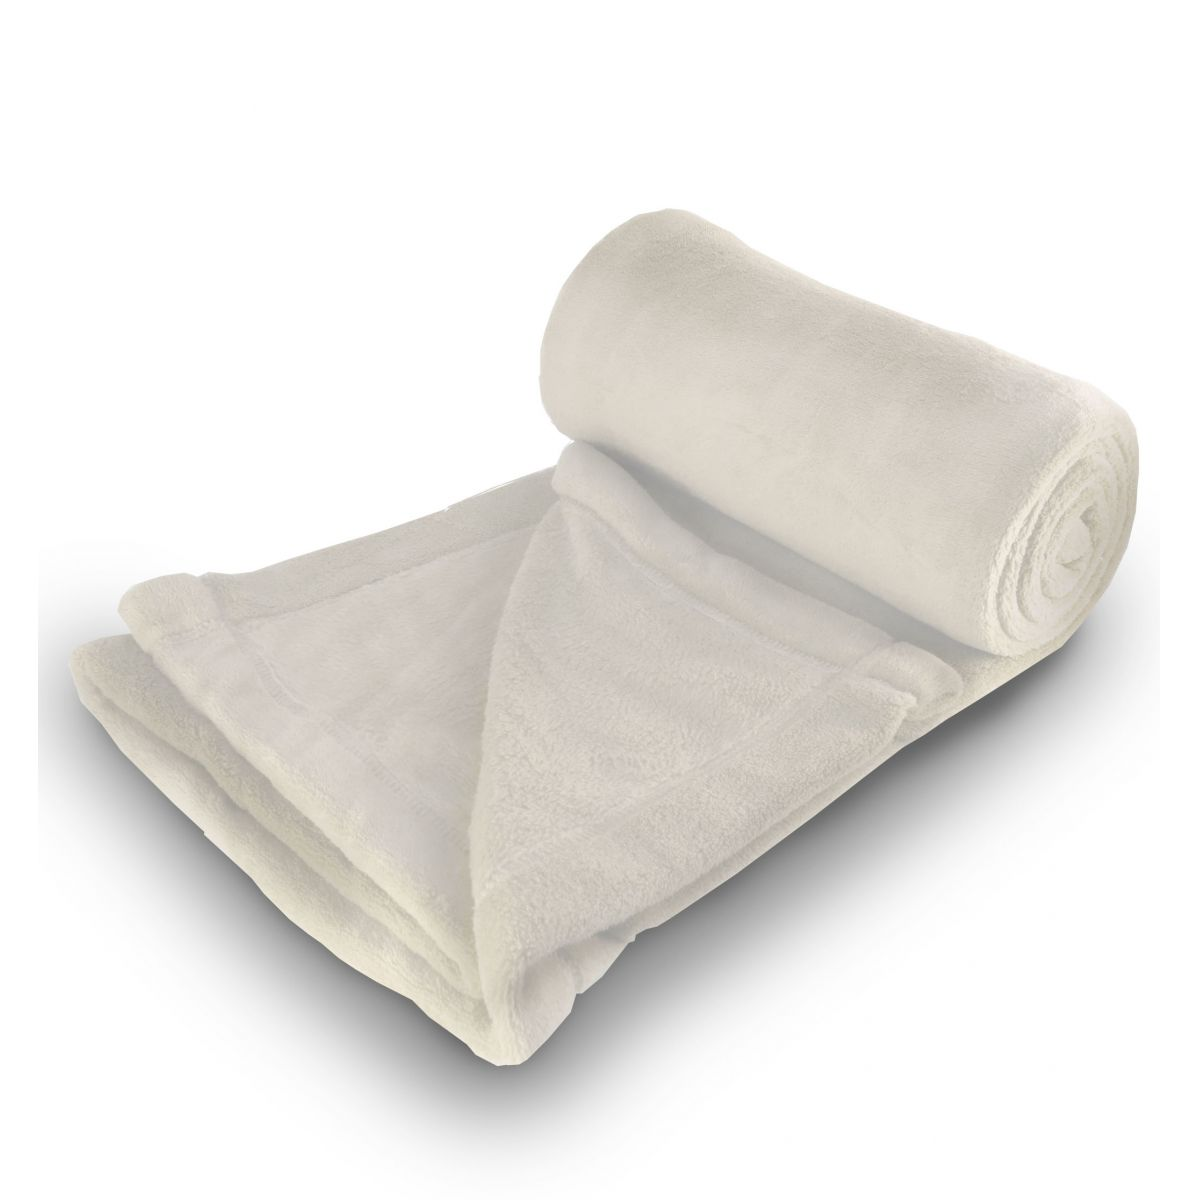 Cobertor de Microfibra King - Marfim